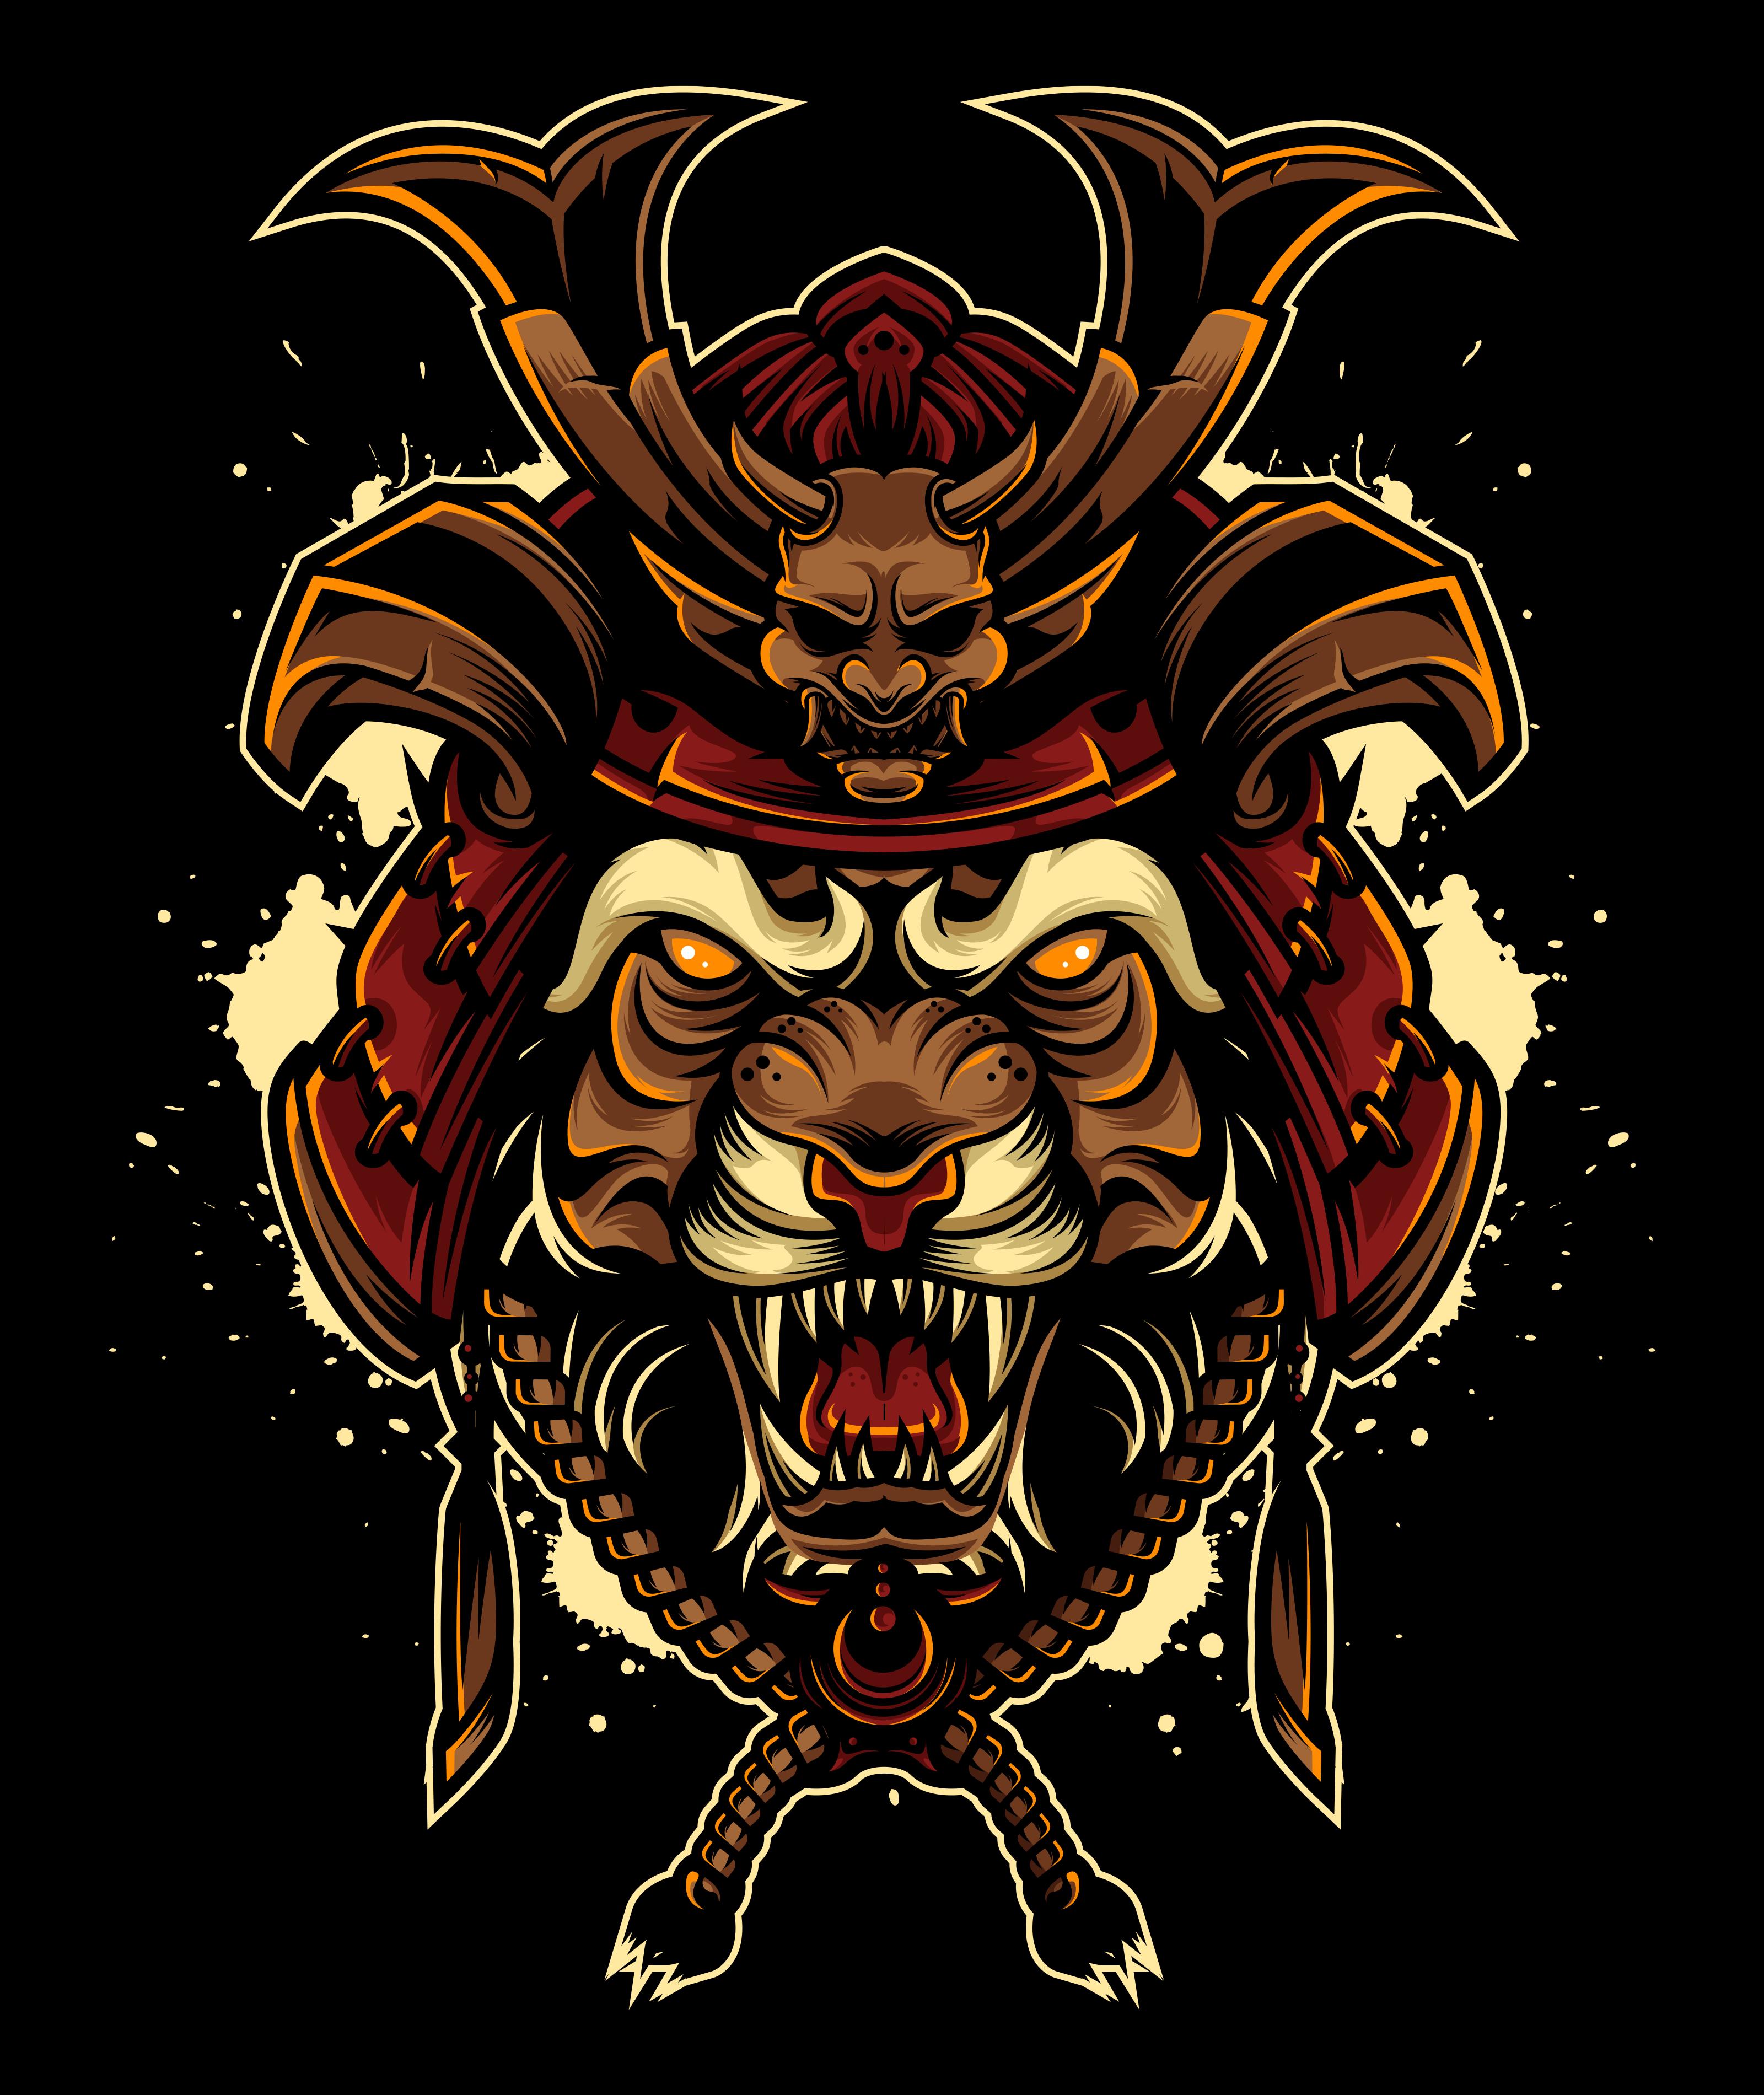 Angry Tiger With Japanese Samurai Helmet Ilustrasi Komik Ilustrasi Gambar